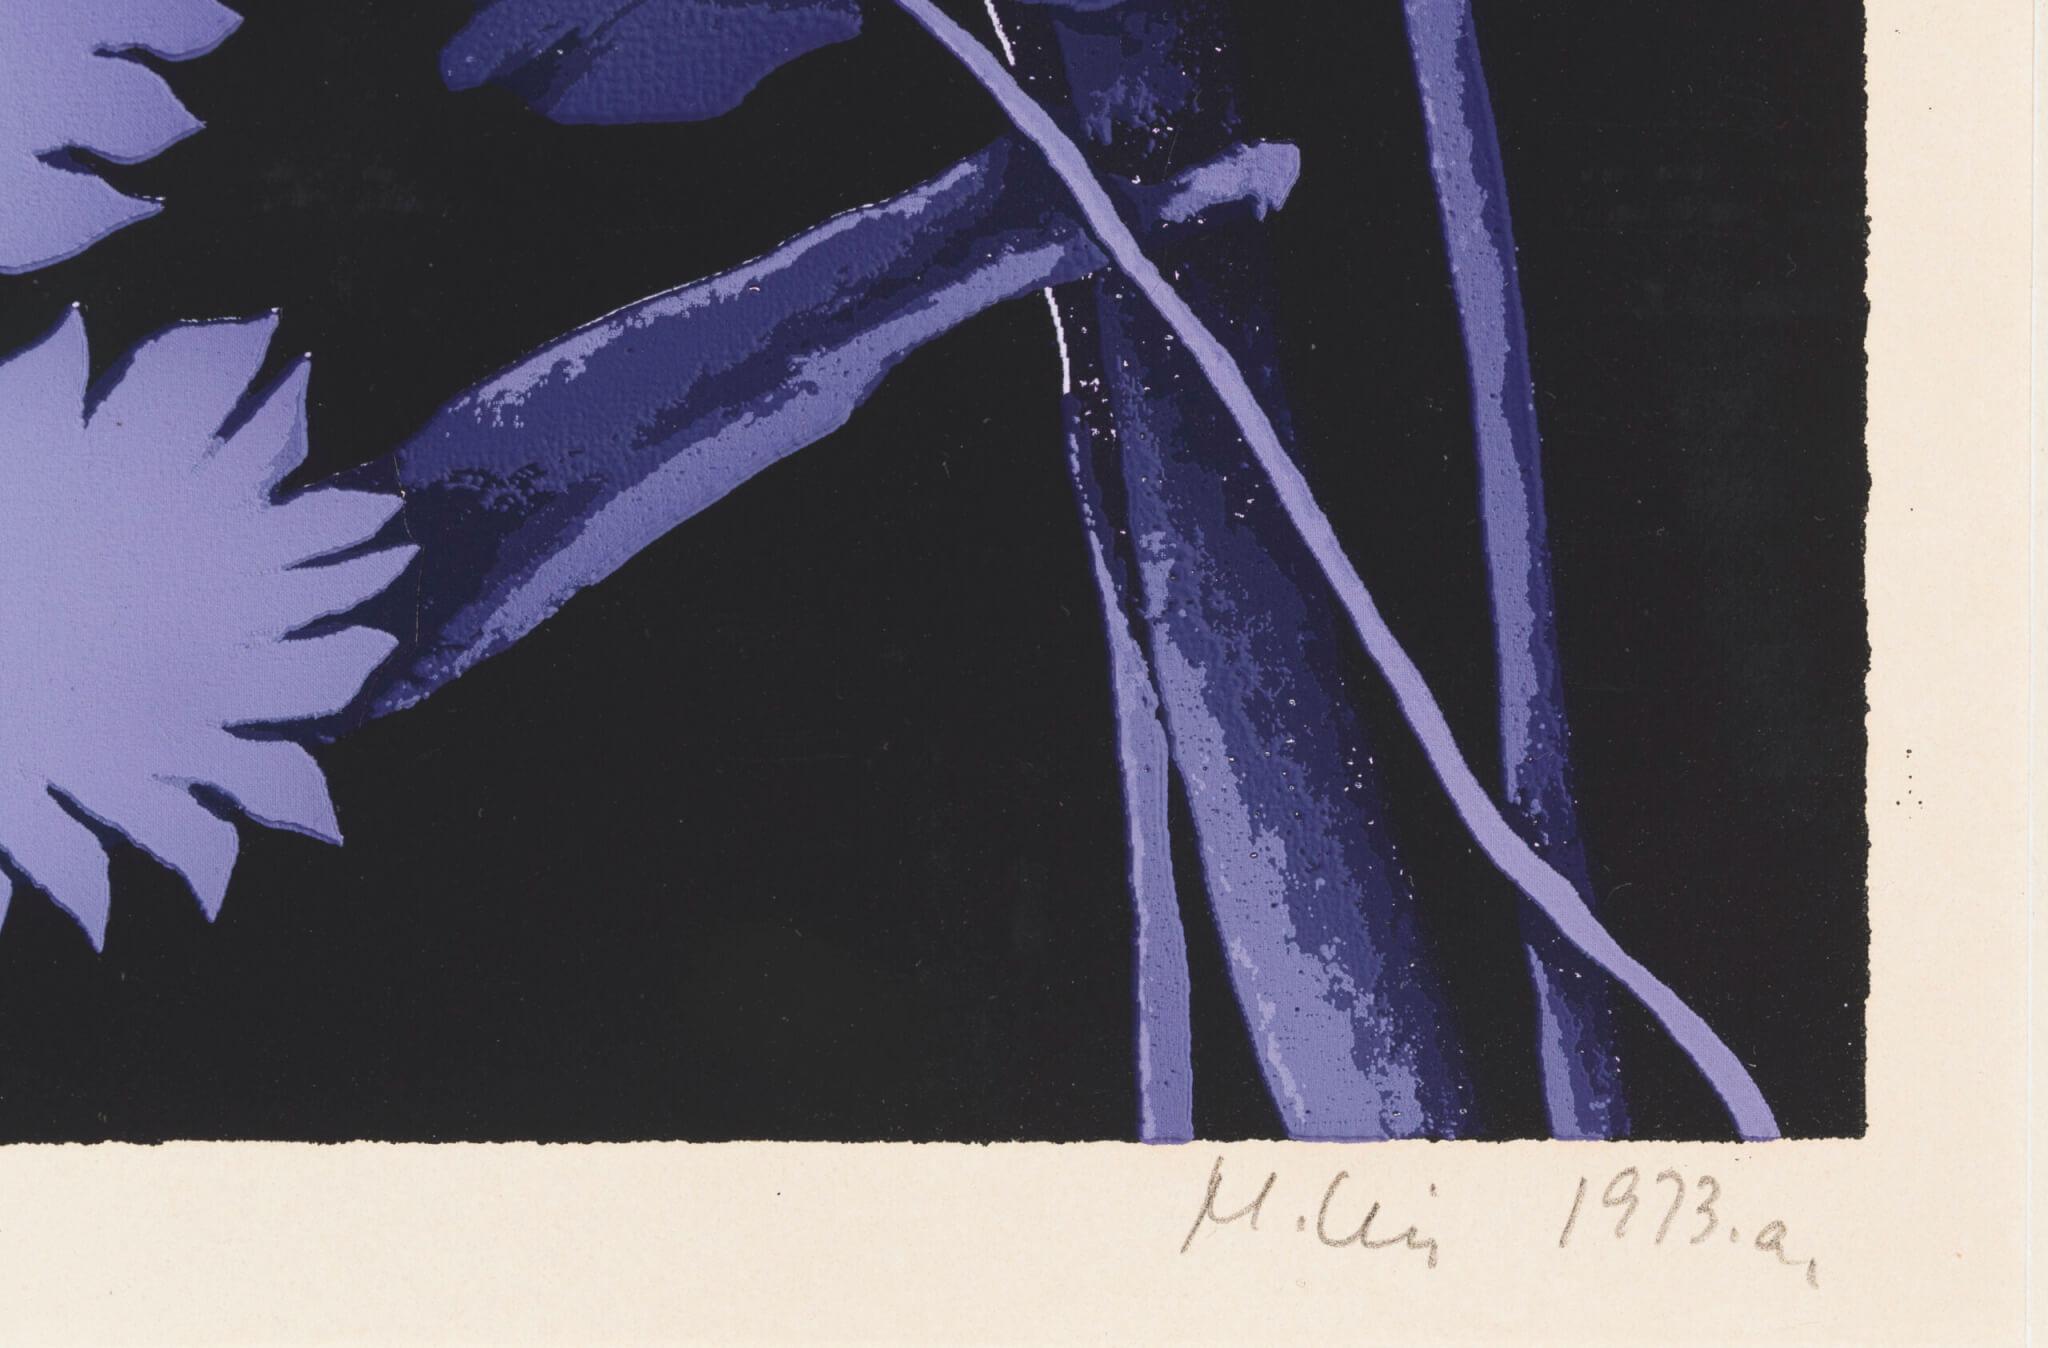 Malle-Leis-Lilled-signatuur